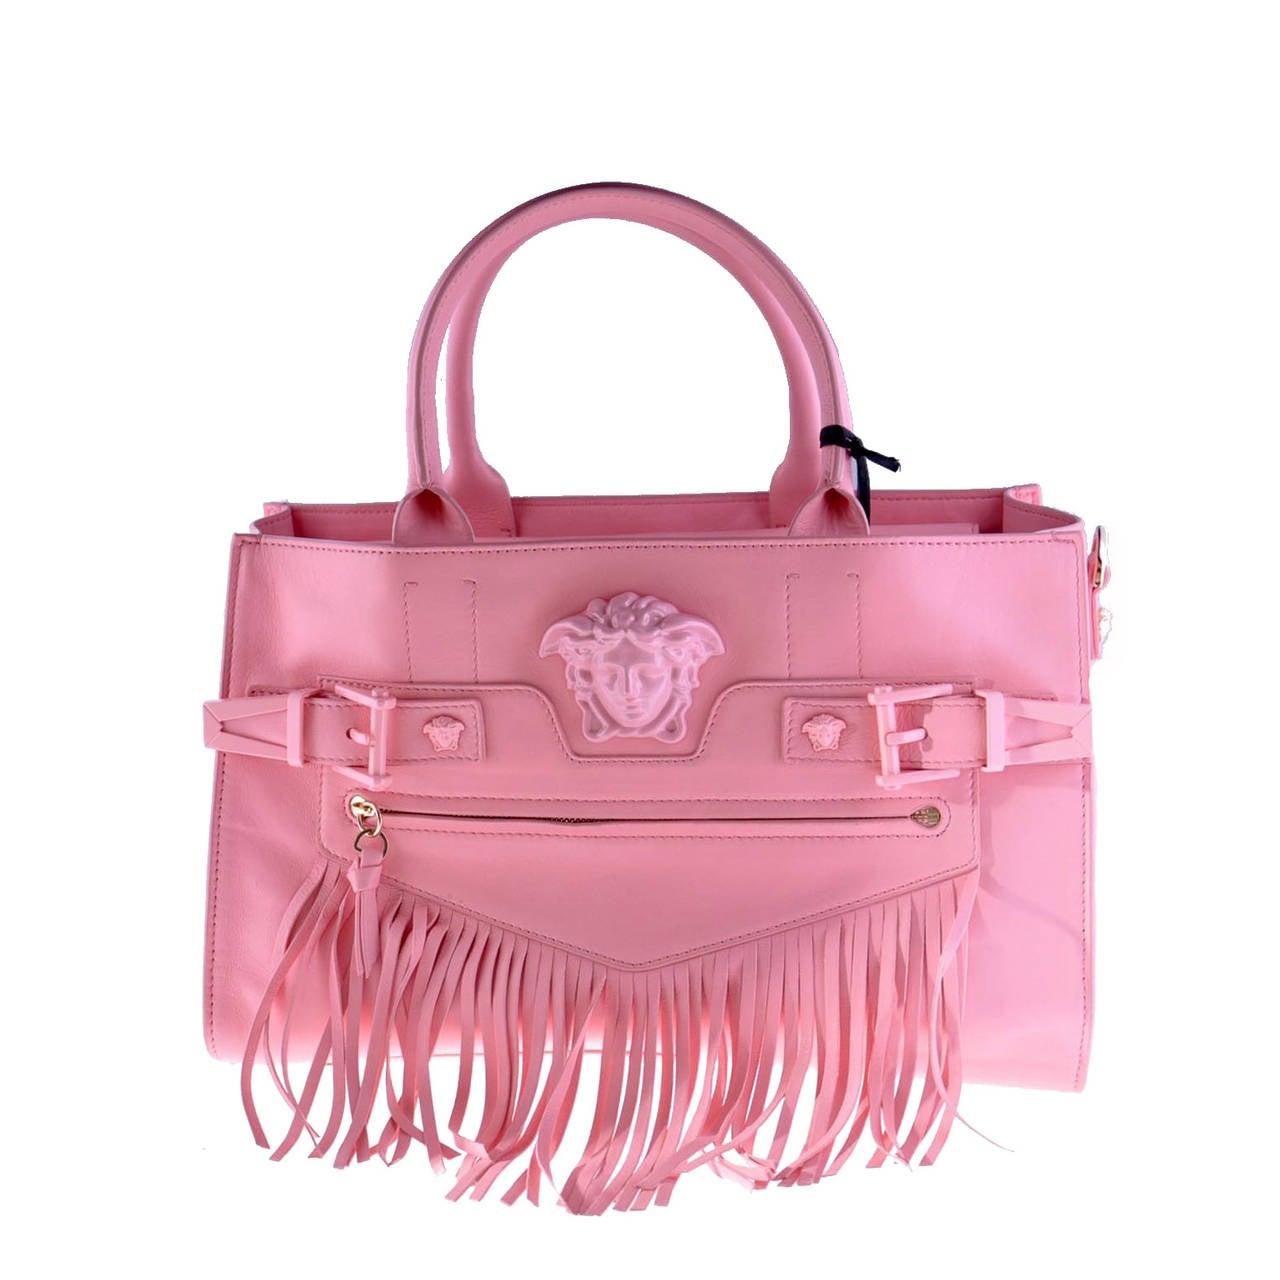 b7177e6a48 New Versace Pink Leather Palazzo Handbag at 1stdibs